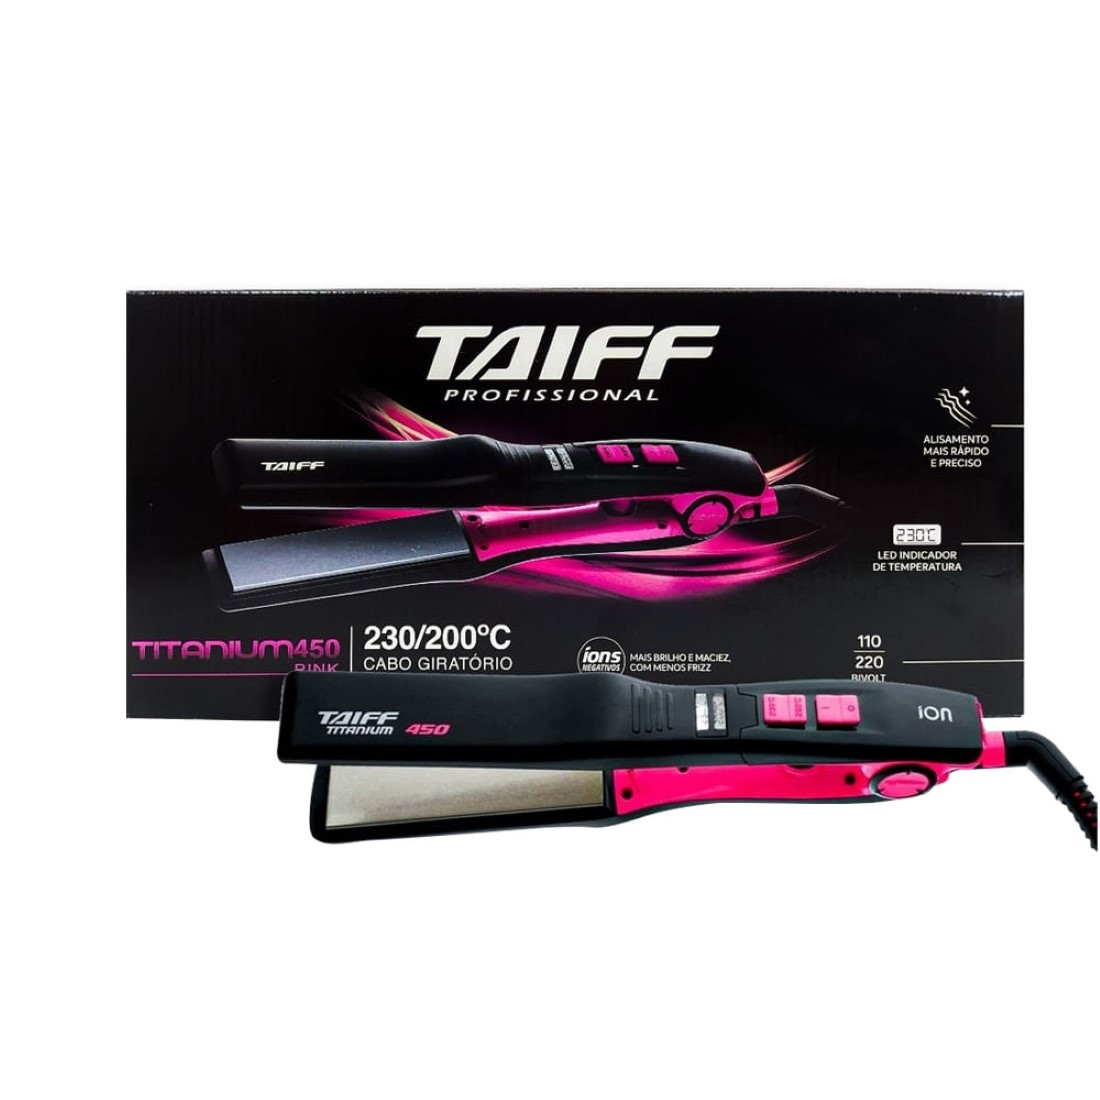 Chapa Titanium 450 Colors Pink 230°C Bivolt - Taiff